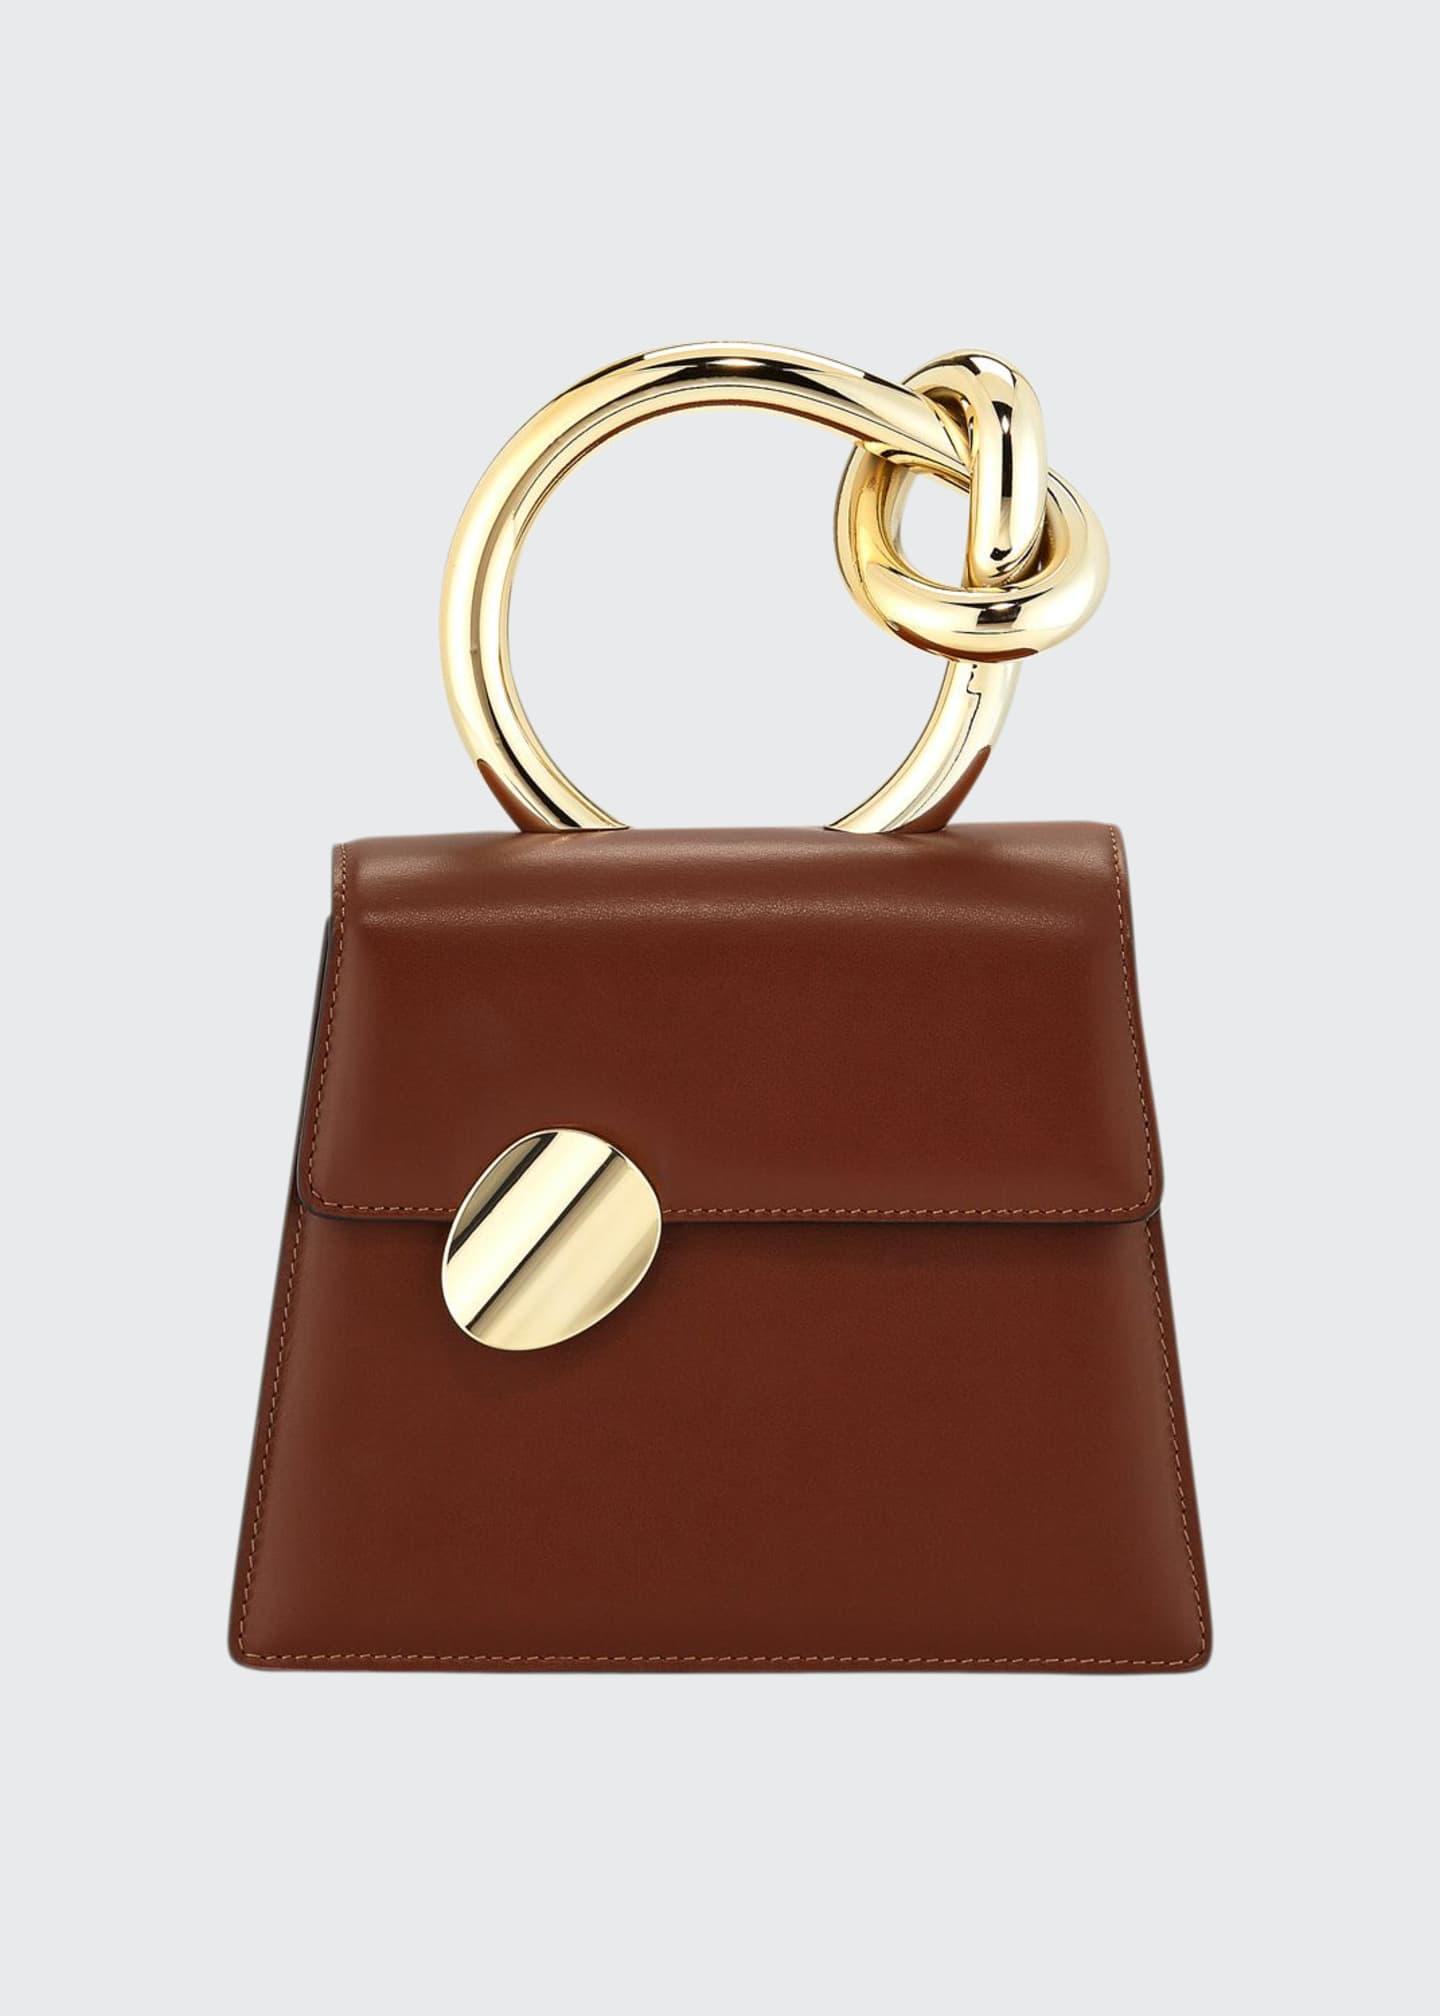 Benedetta Bruzziches Brigitta Small Flap Top Handle Bag,